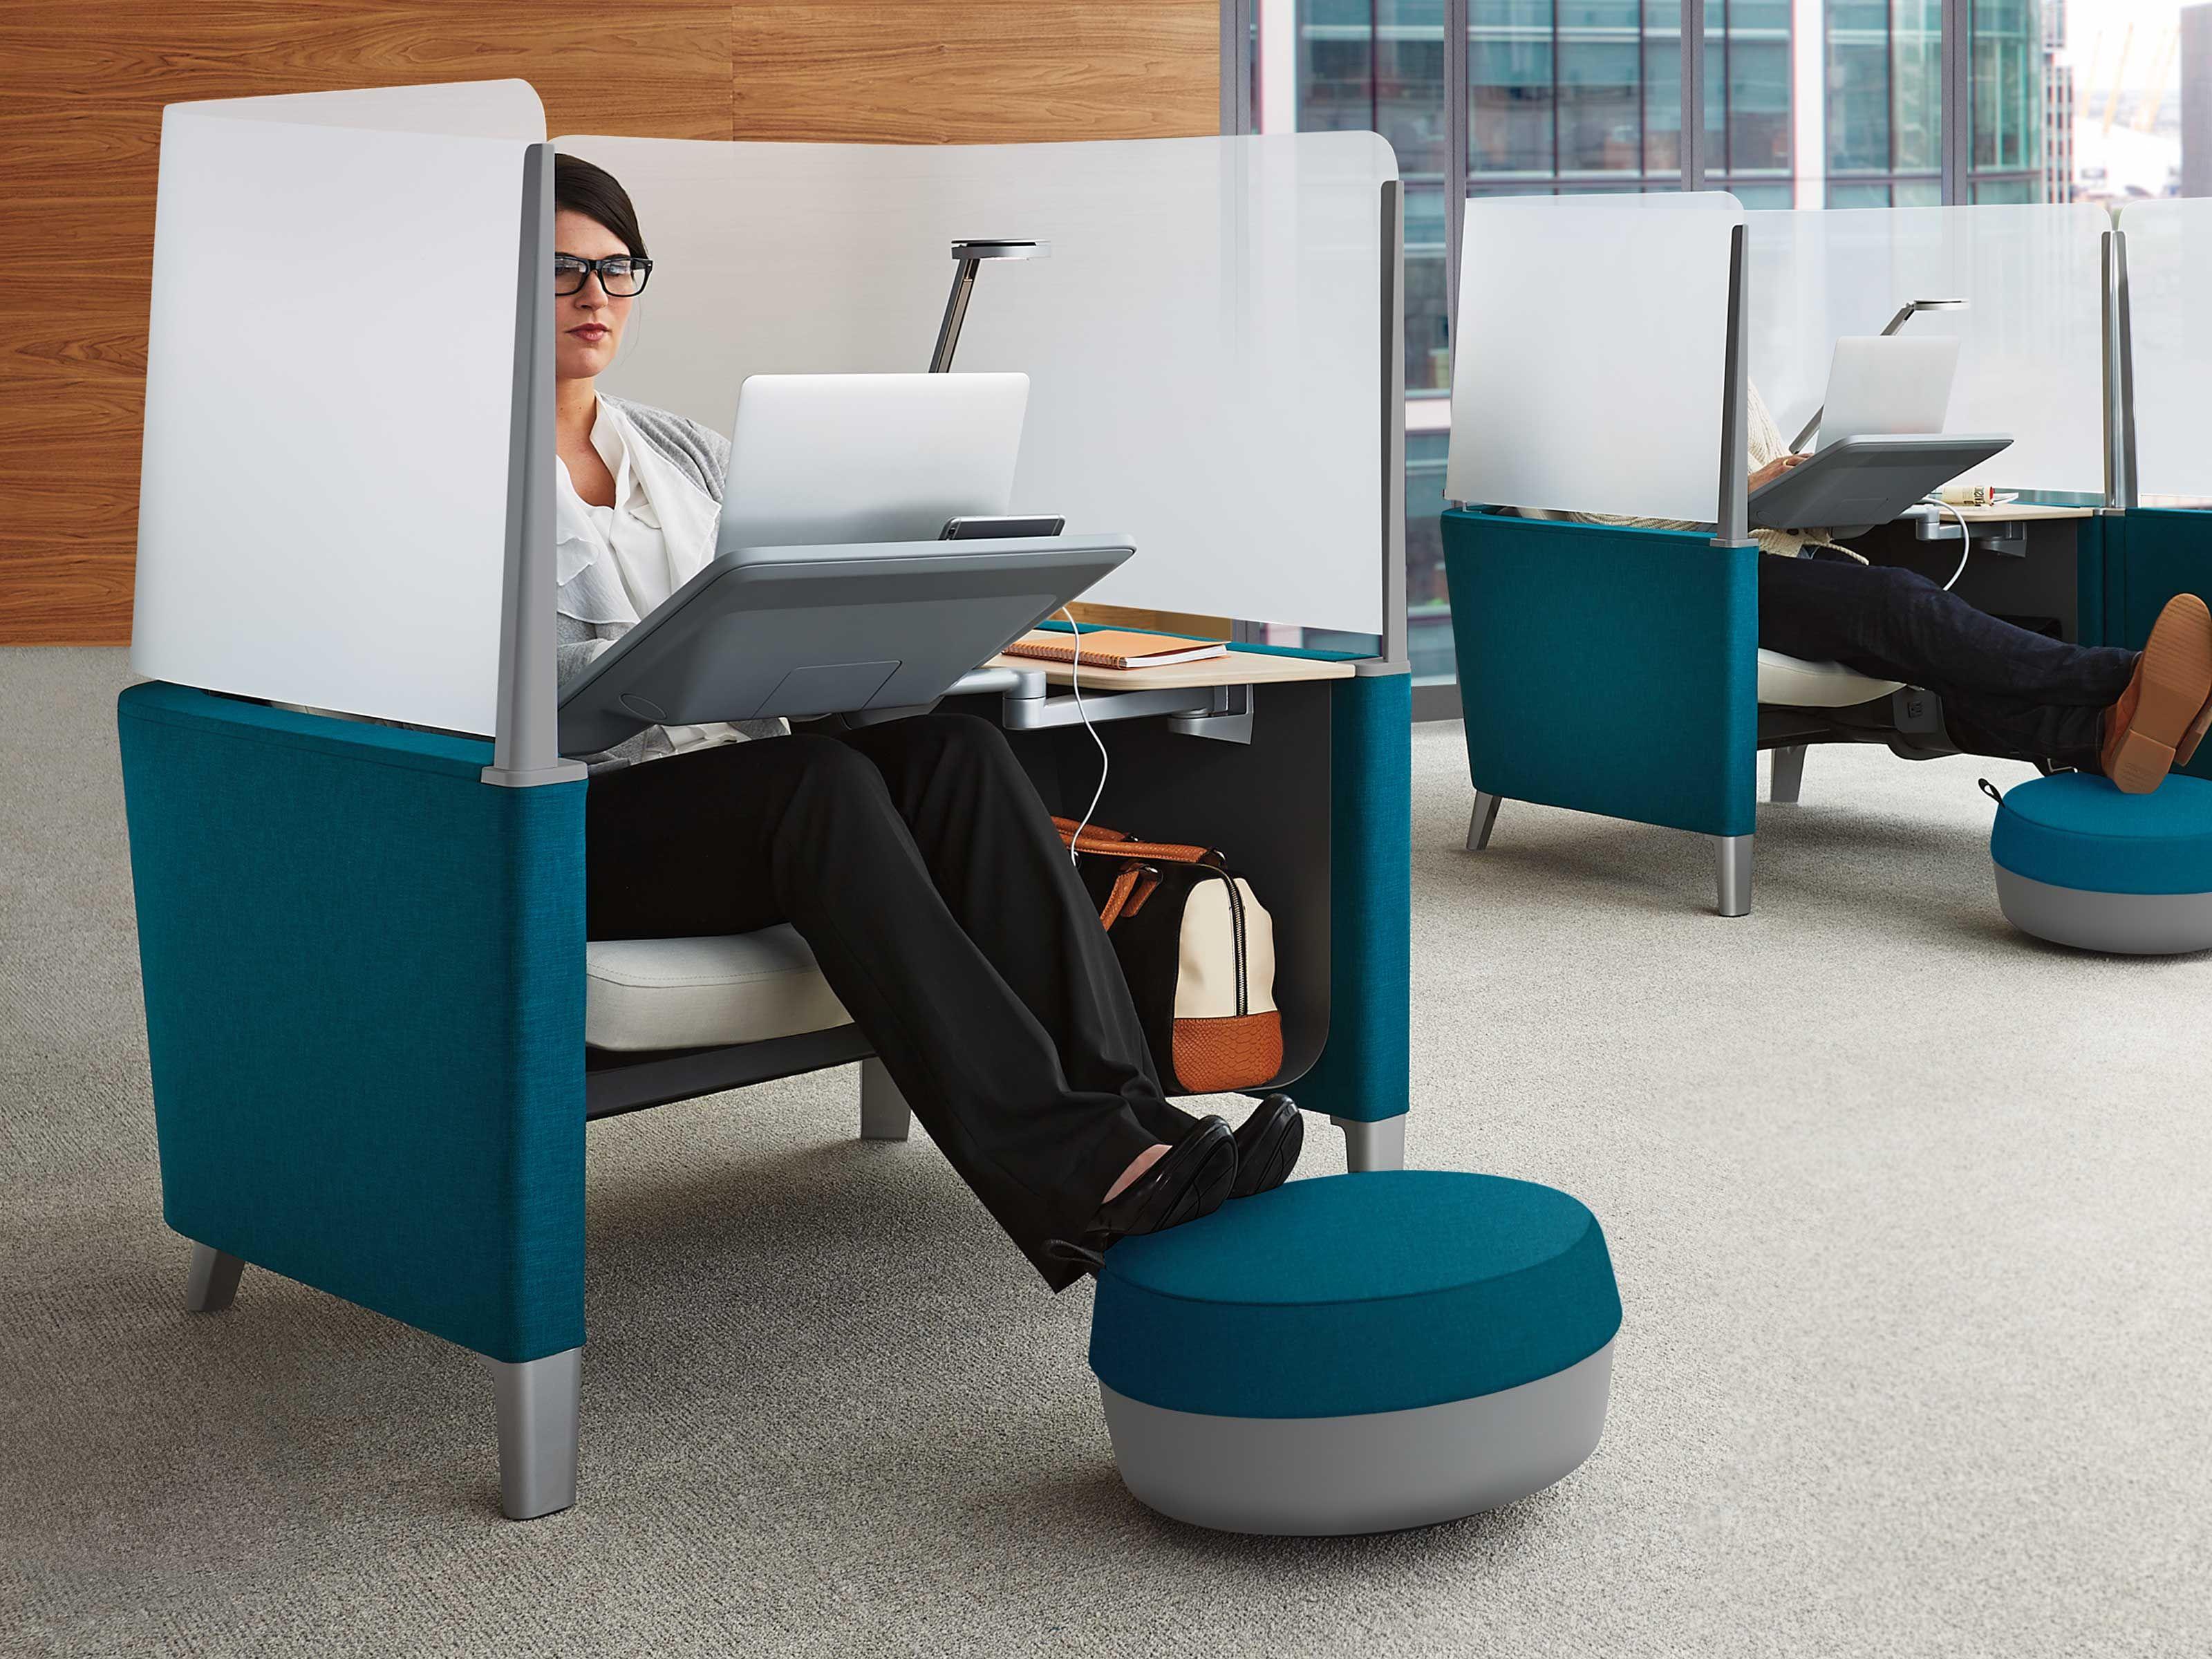 Best Ideas About Modular Workstations On Pinterest Open - Open office furniture